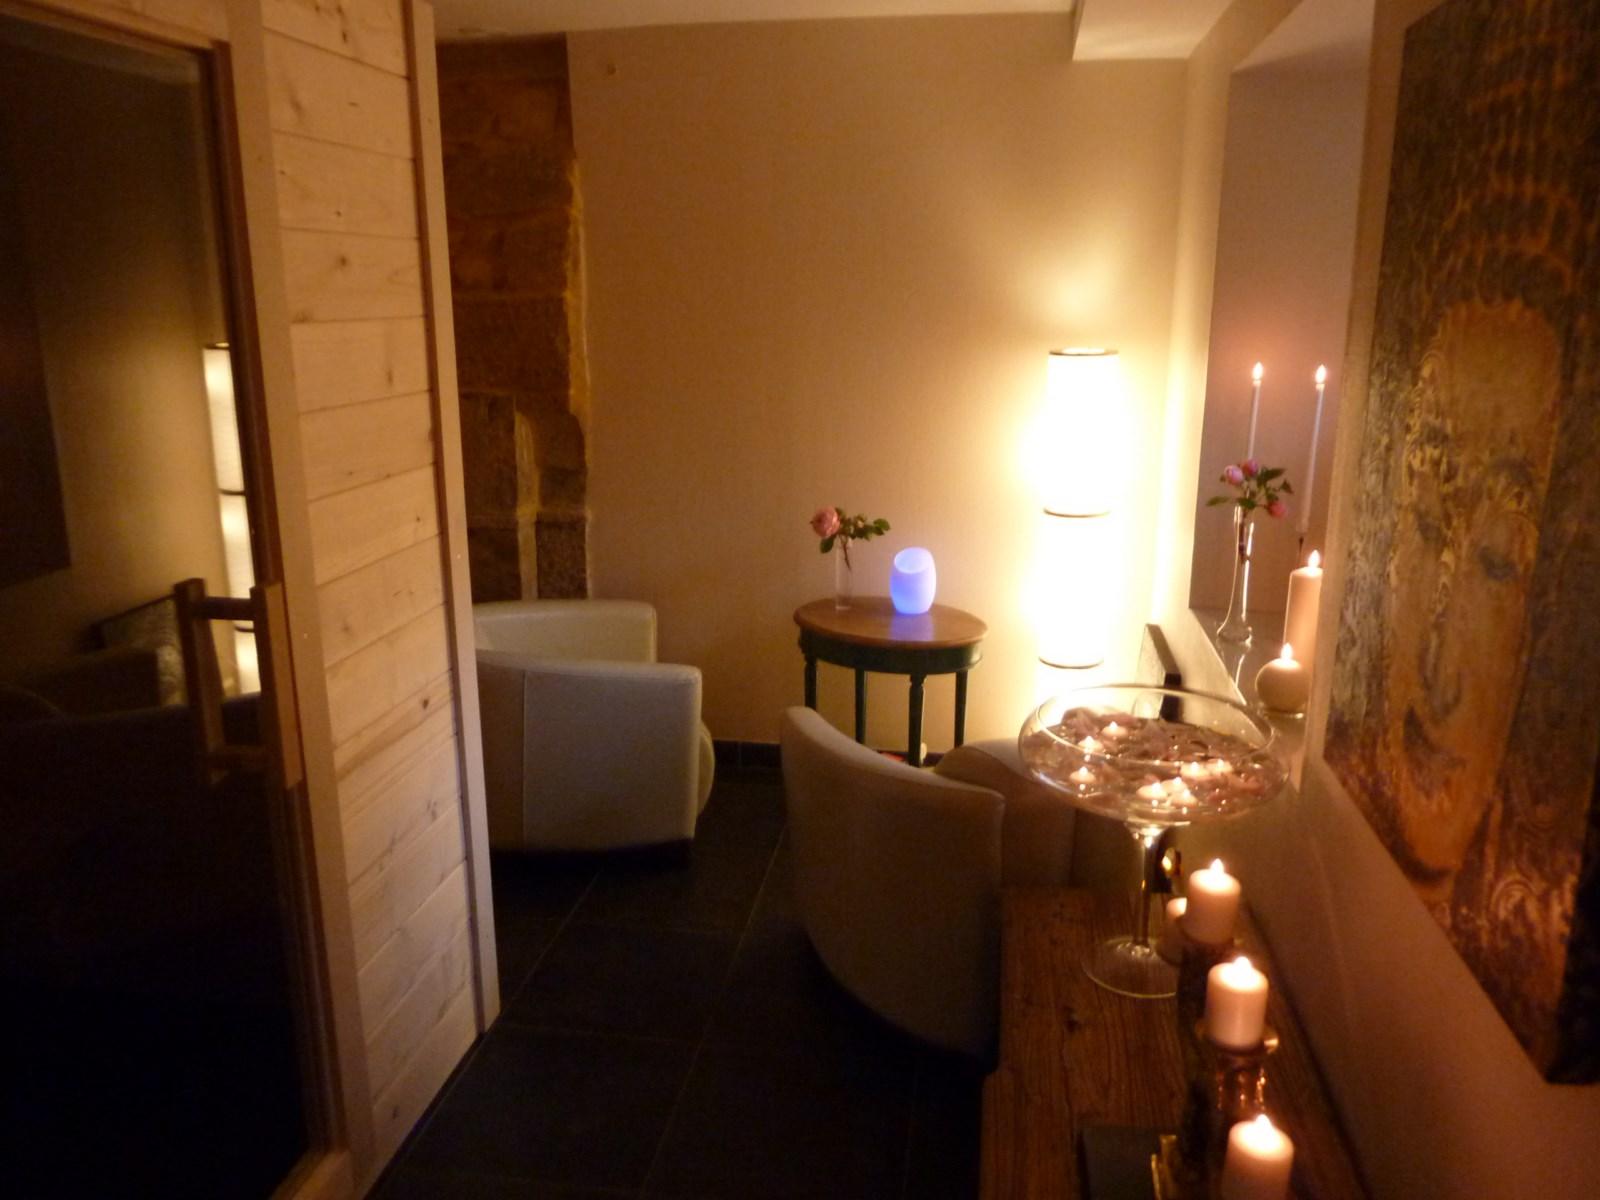 Deco Salle De Massage Zen Storeimages With Deco Salle De Massage